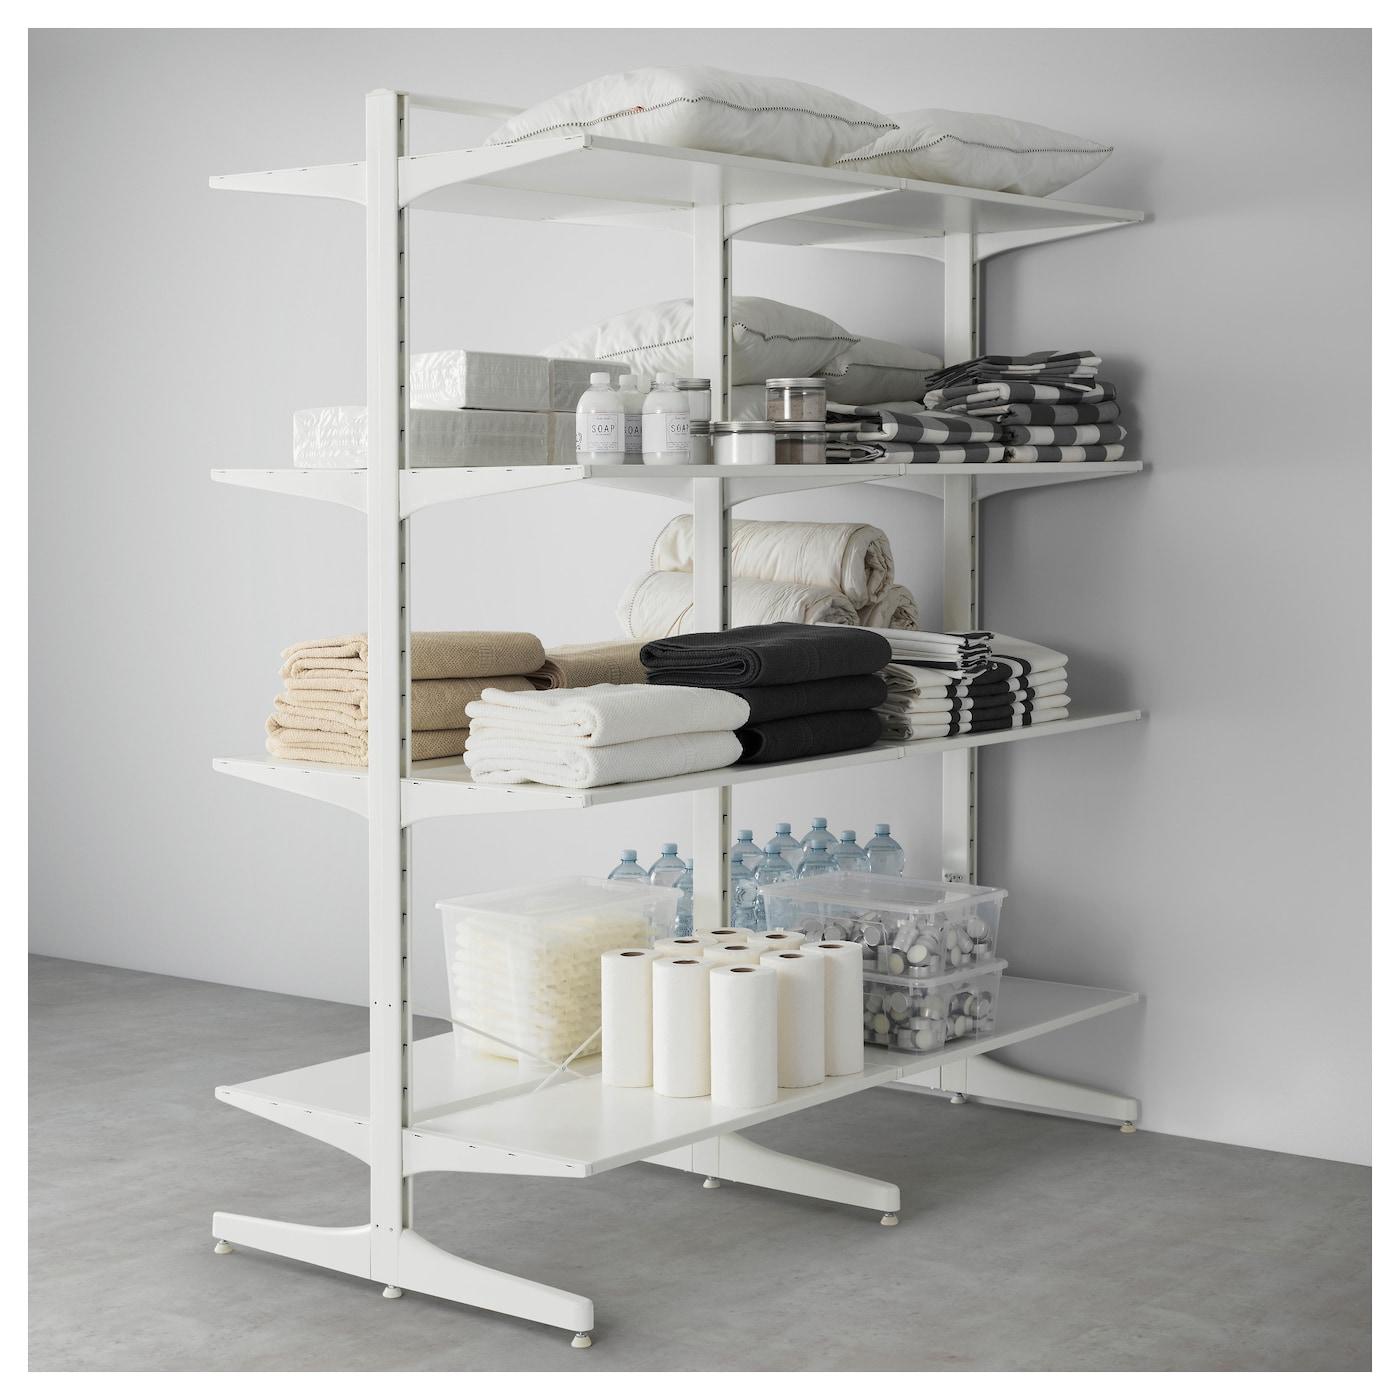 algot montant pied tablettes blanc 167x83x194 cm ikea. Black Bedroom Furniture Sets. Home Design Ideas